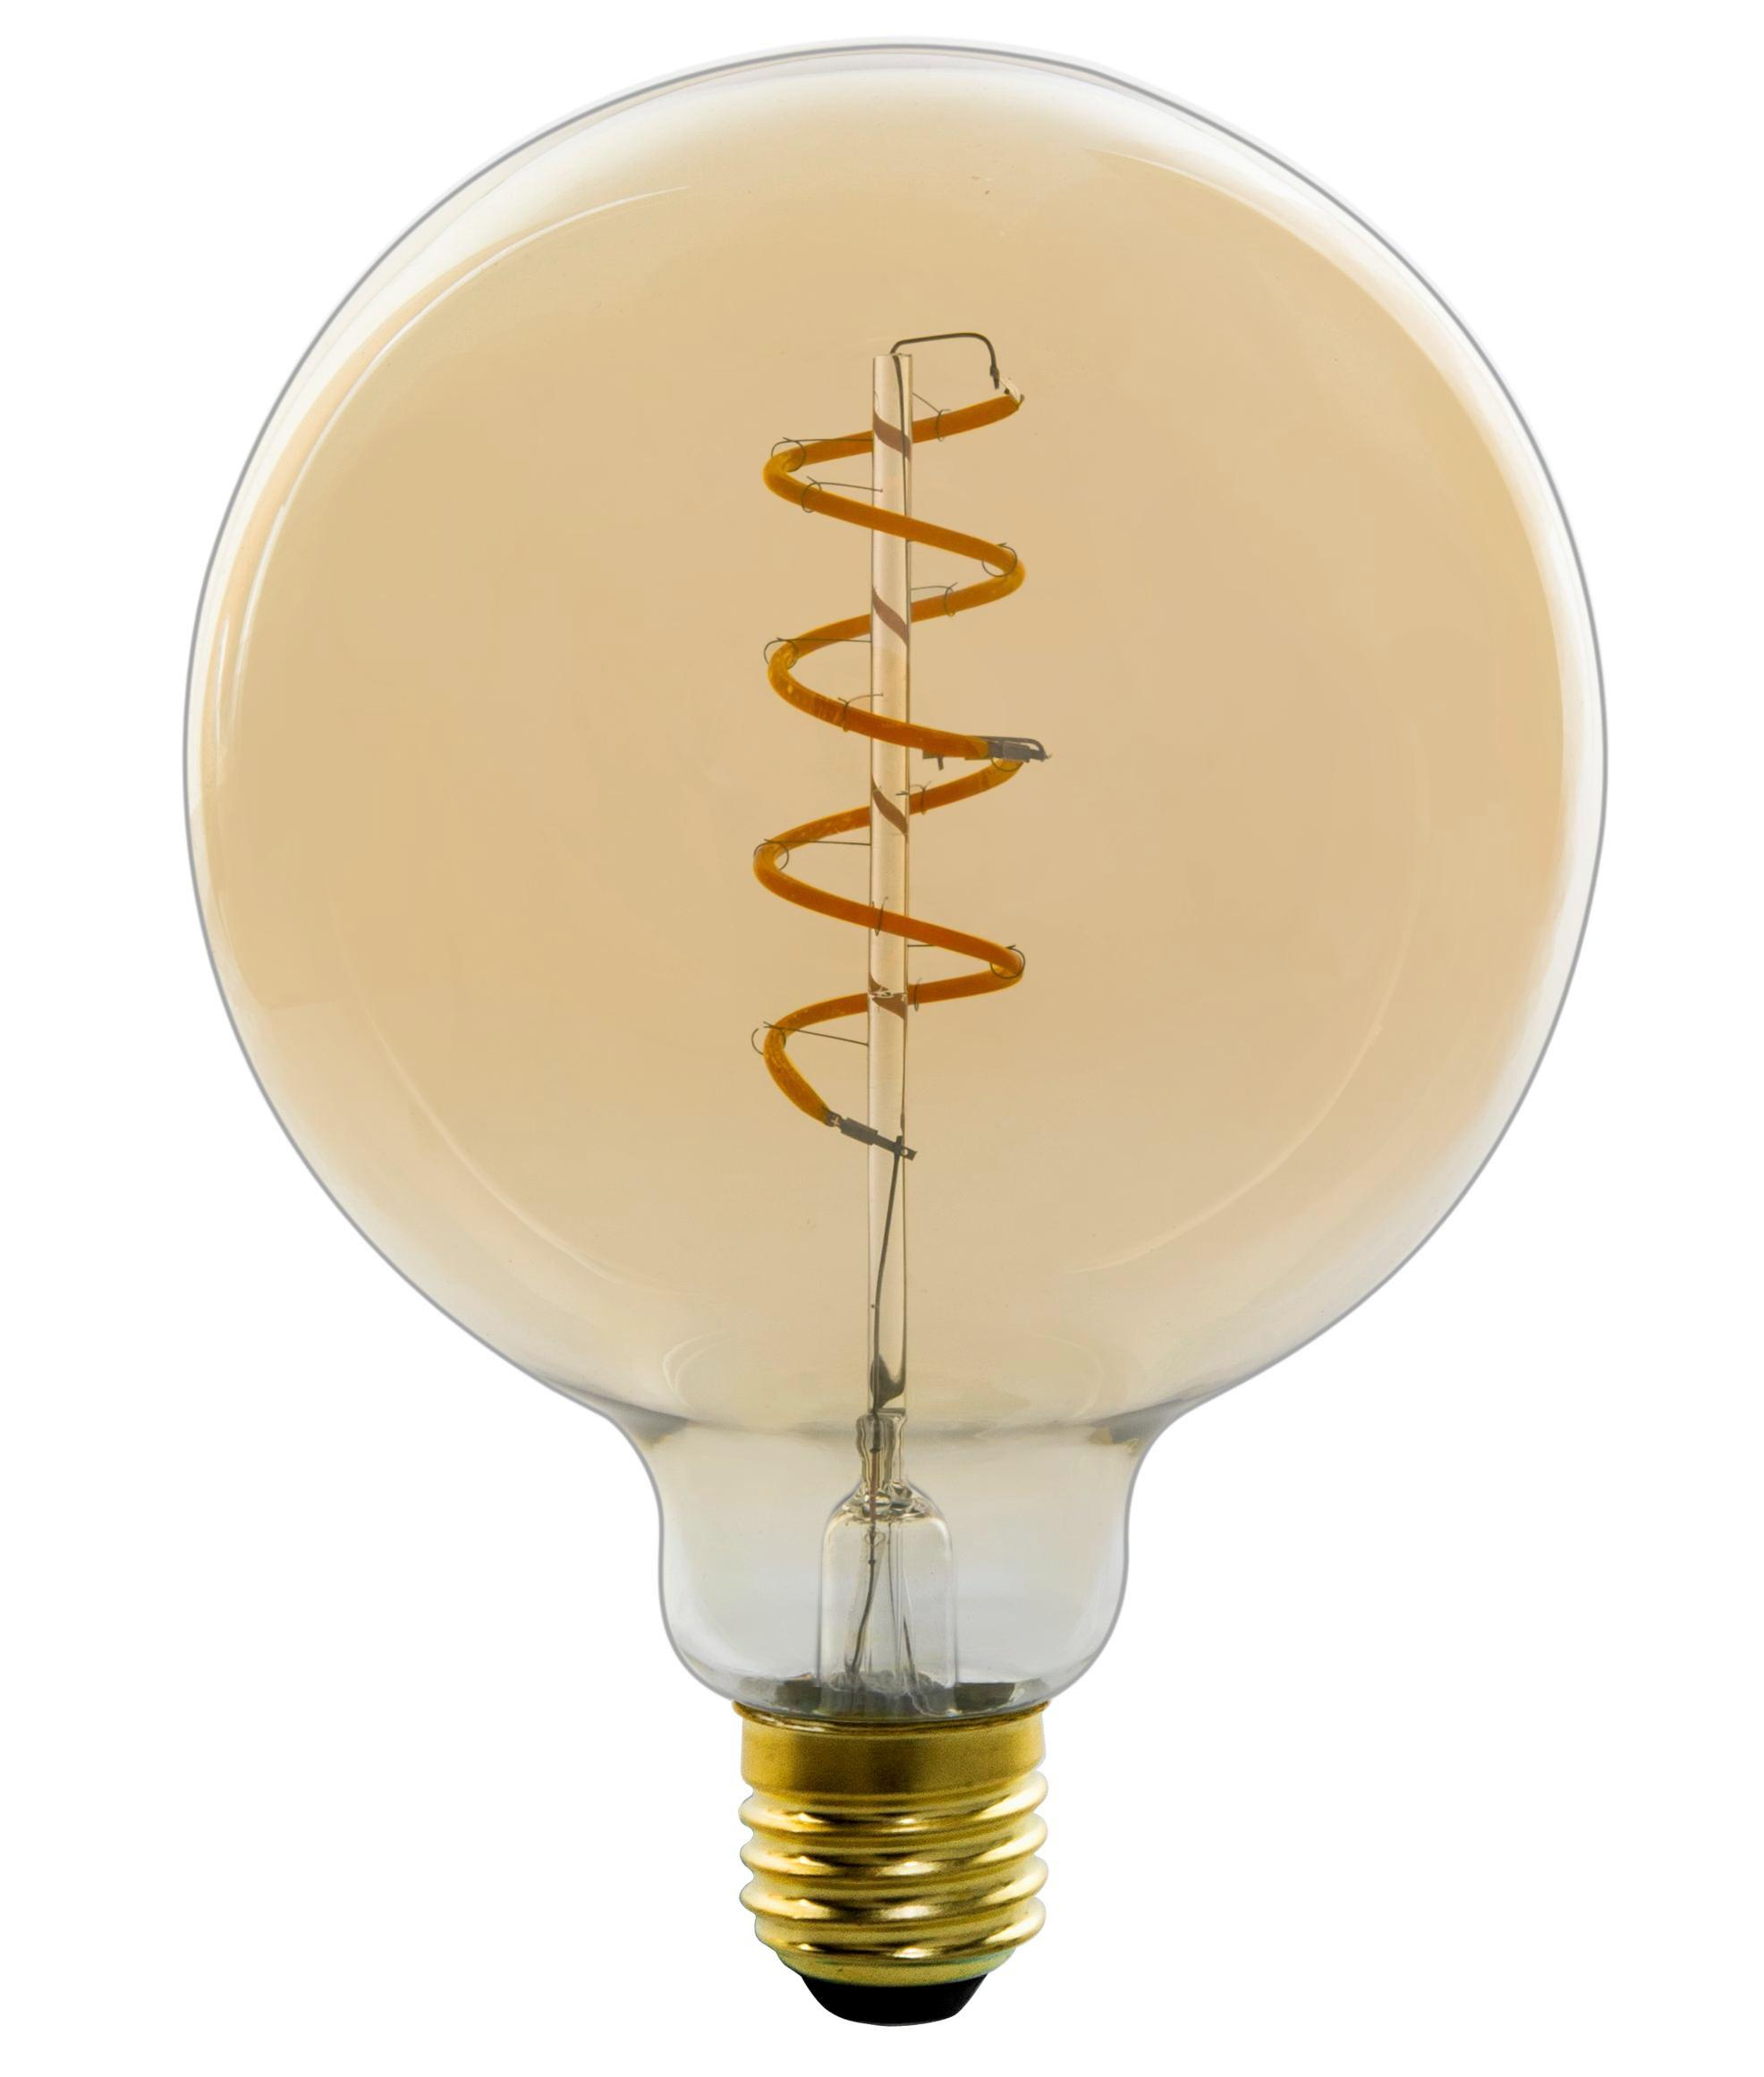 Deko Leuchtmittel 11404fma Max. 4 Watt   Goldfarben, Glas/Metall (12